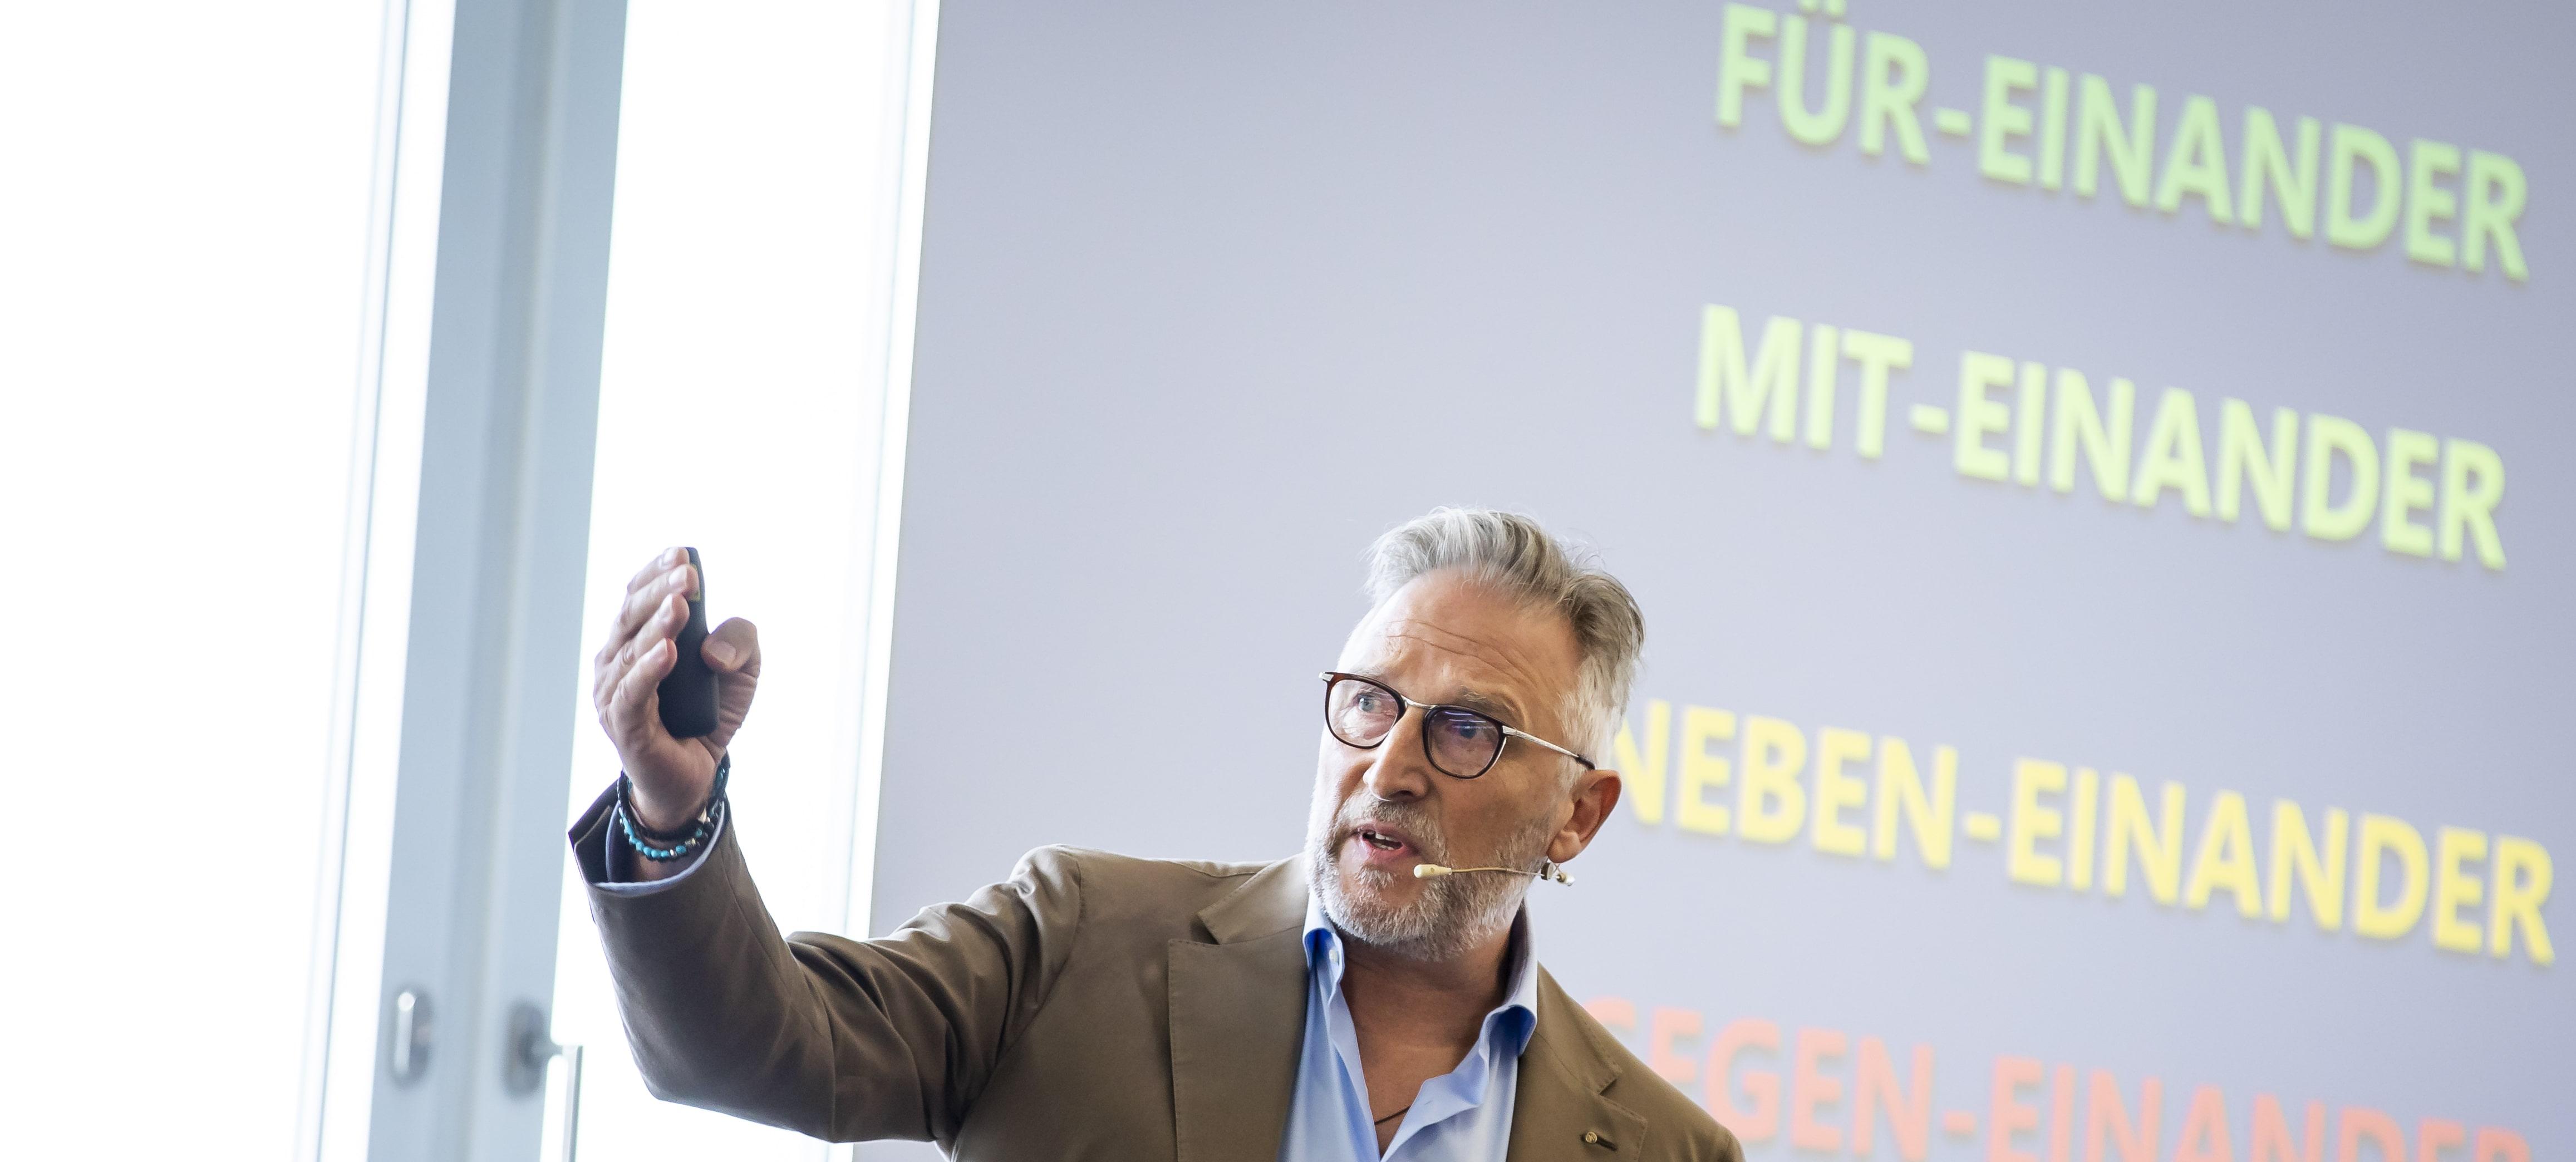 Expert Marketplace -  Wolfgang Walter Wulle